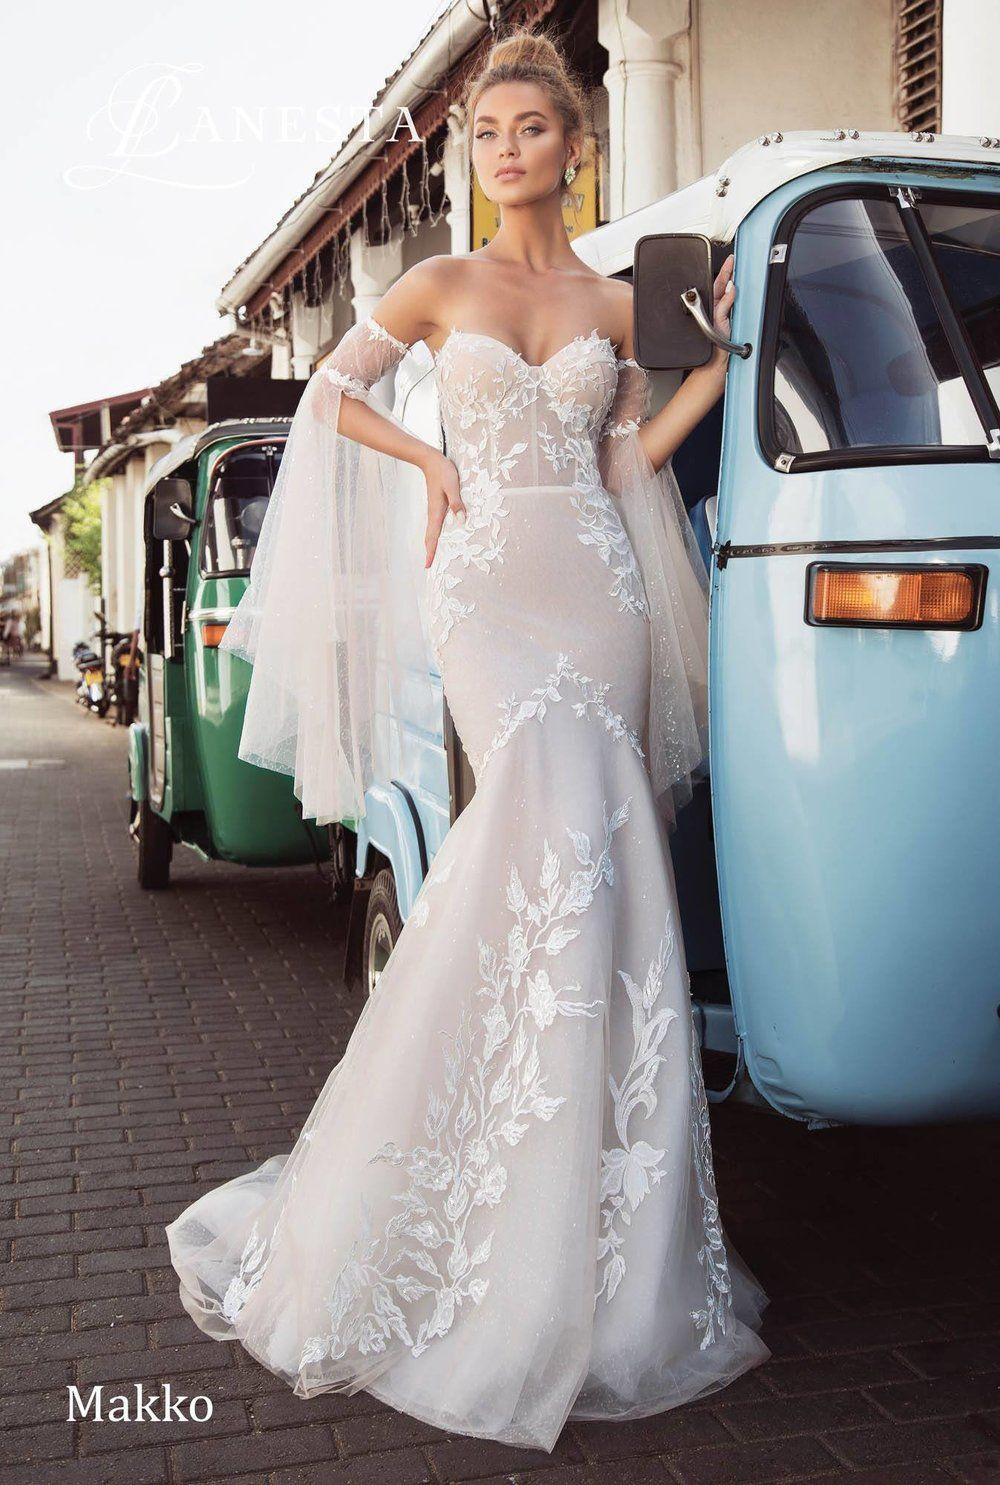 Royal themed wedding dresses  MAKKO wedding dress by LANESTA  Bridal Royal Fashion  Pinterest